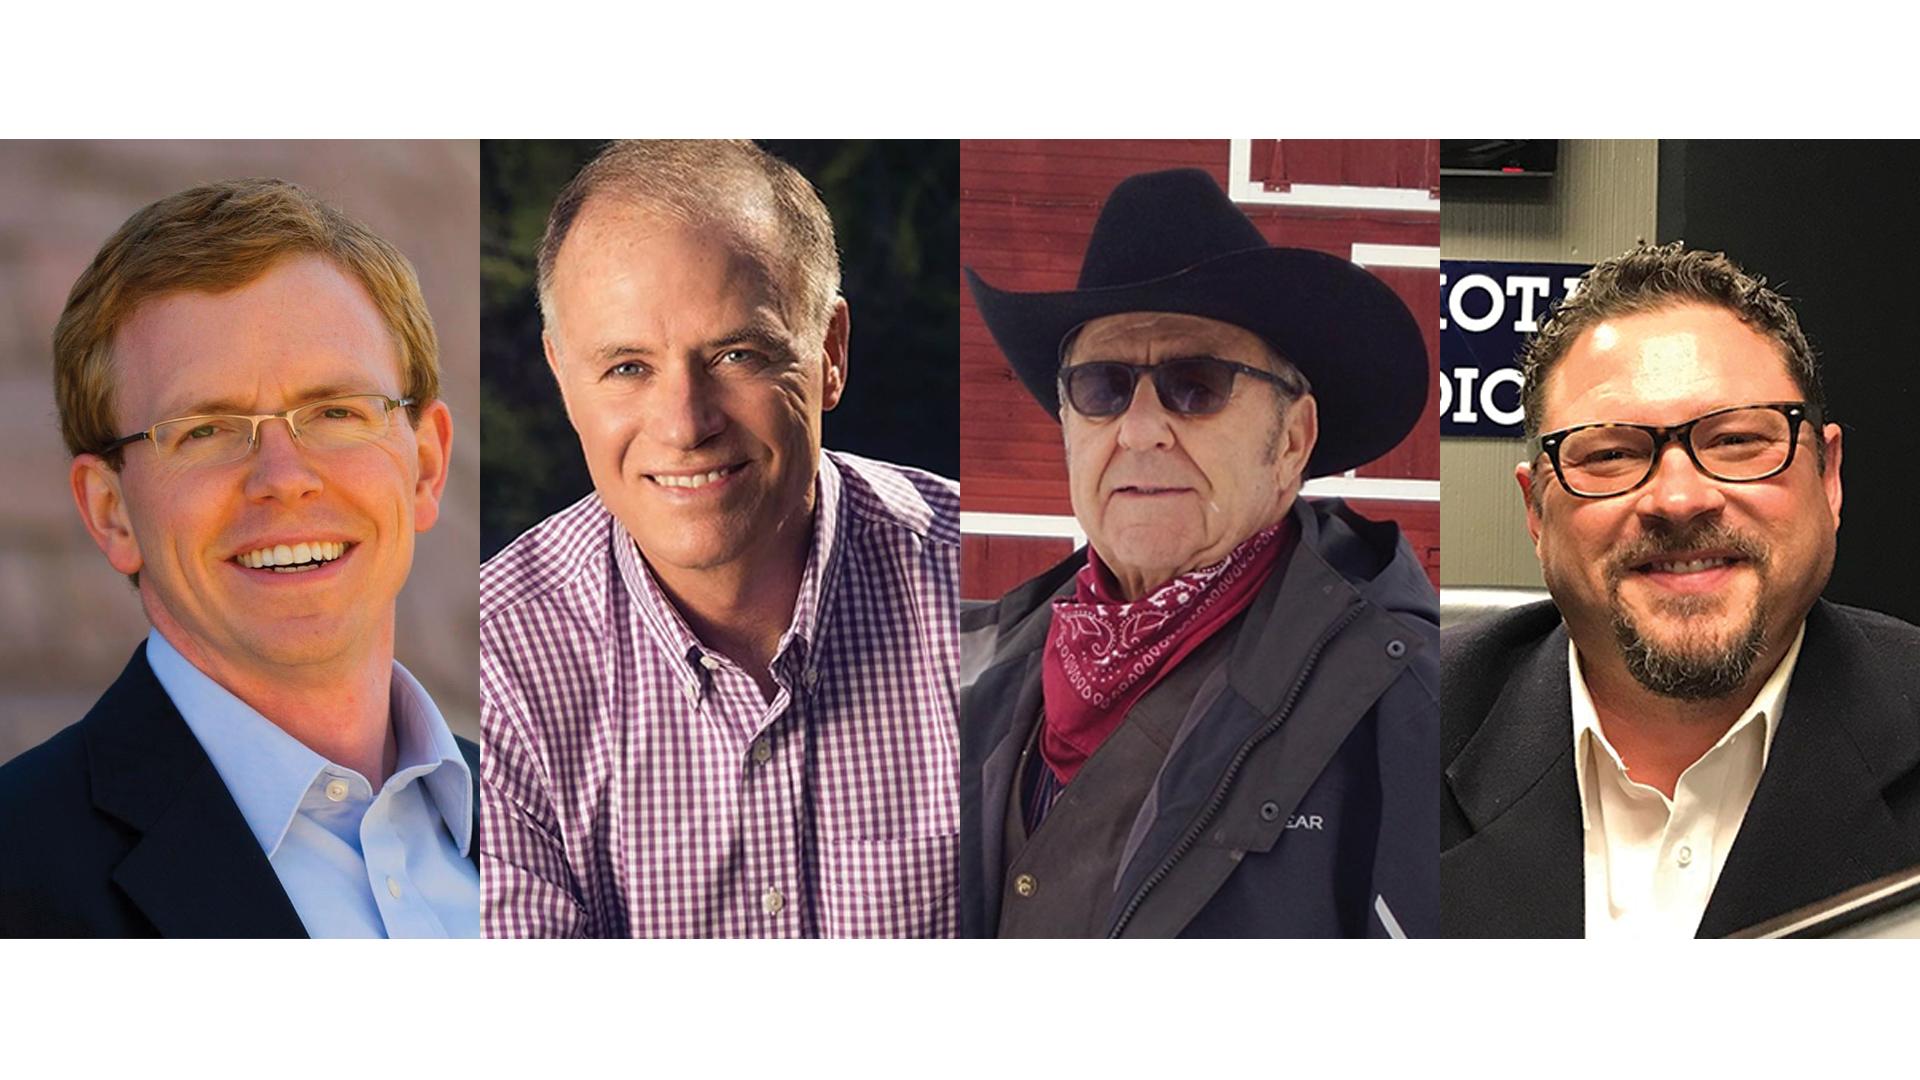 Dusty Johnson, Tim Bjorkman, Ron Wieczorek and George Hendrickson